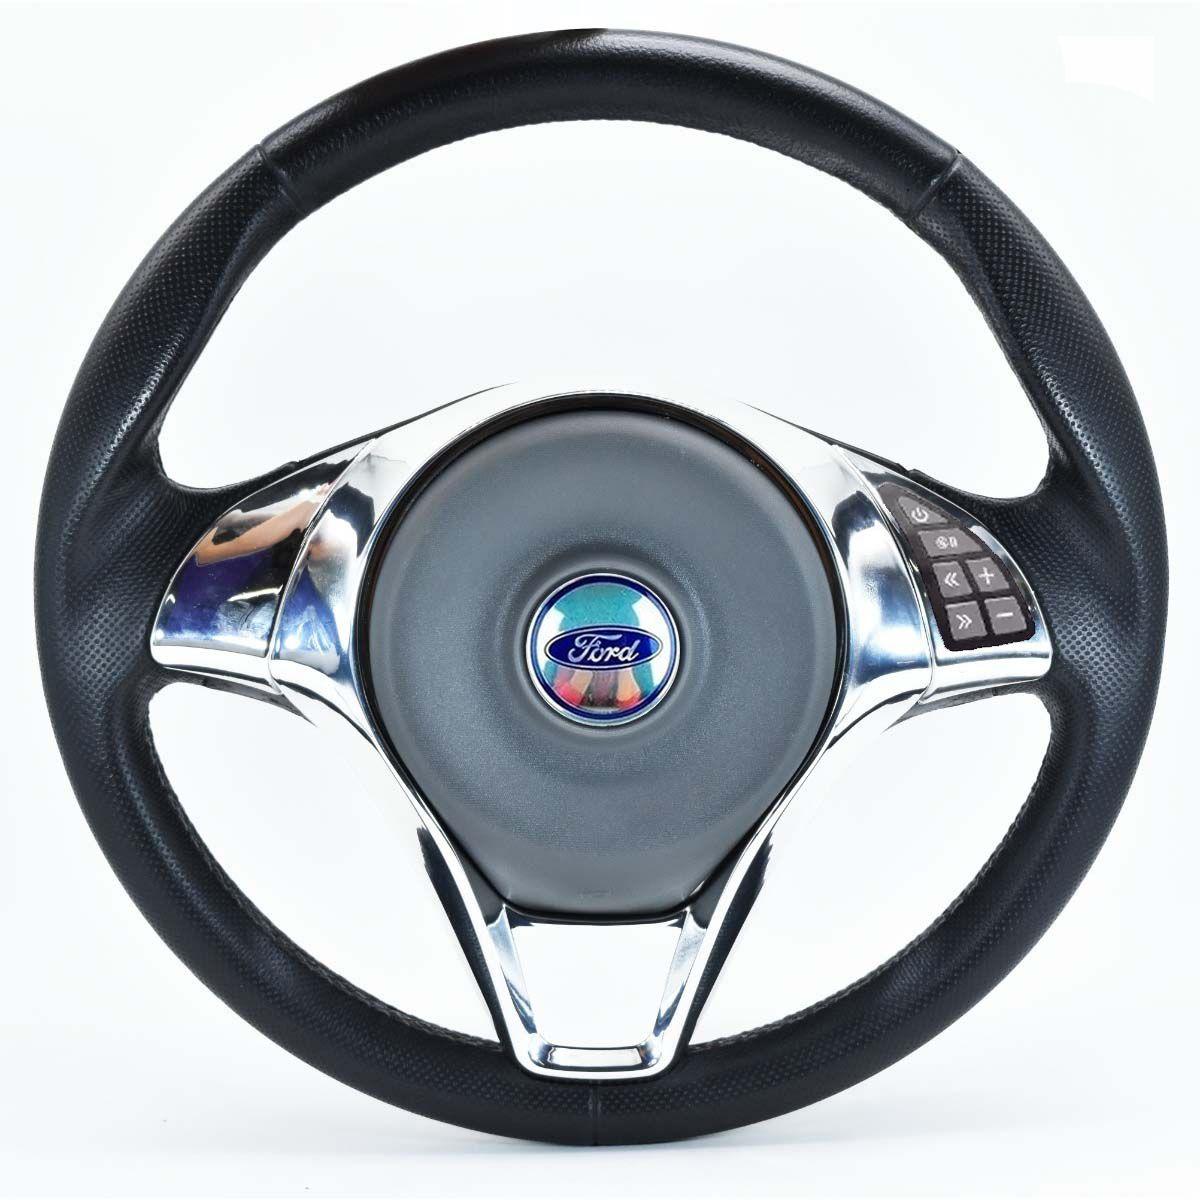 Volante Multifuncional Palio Sporting Ford Ka Fiesta Escort Zetec Hobby Pampa F100 F1000 F75 F250 Verona Del Rey Belina Ecosport Logus Acionador de Buzia + Cubo